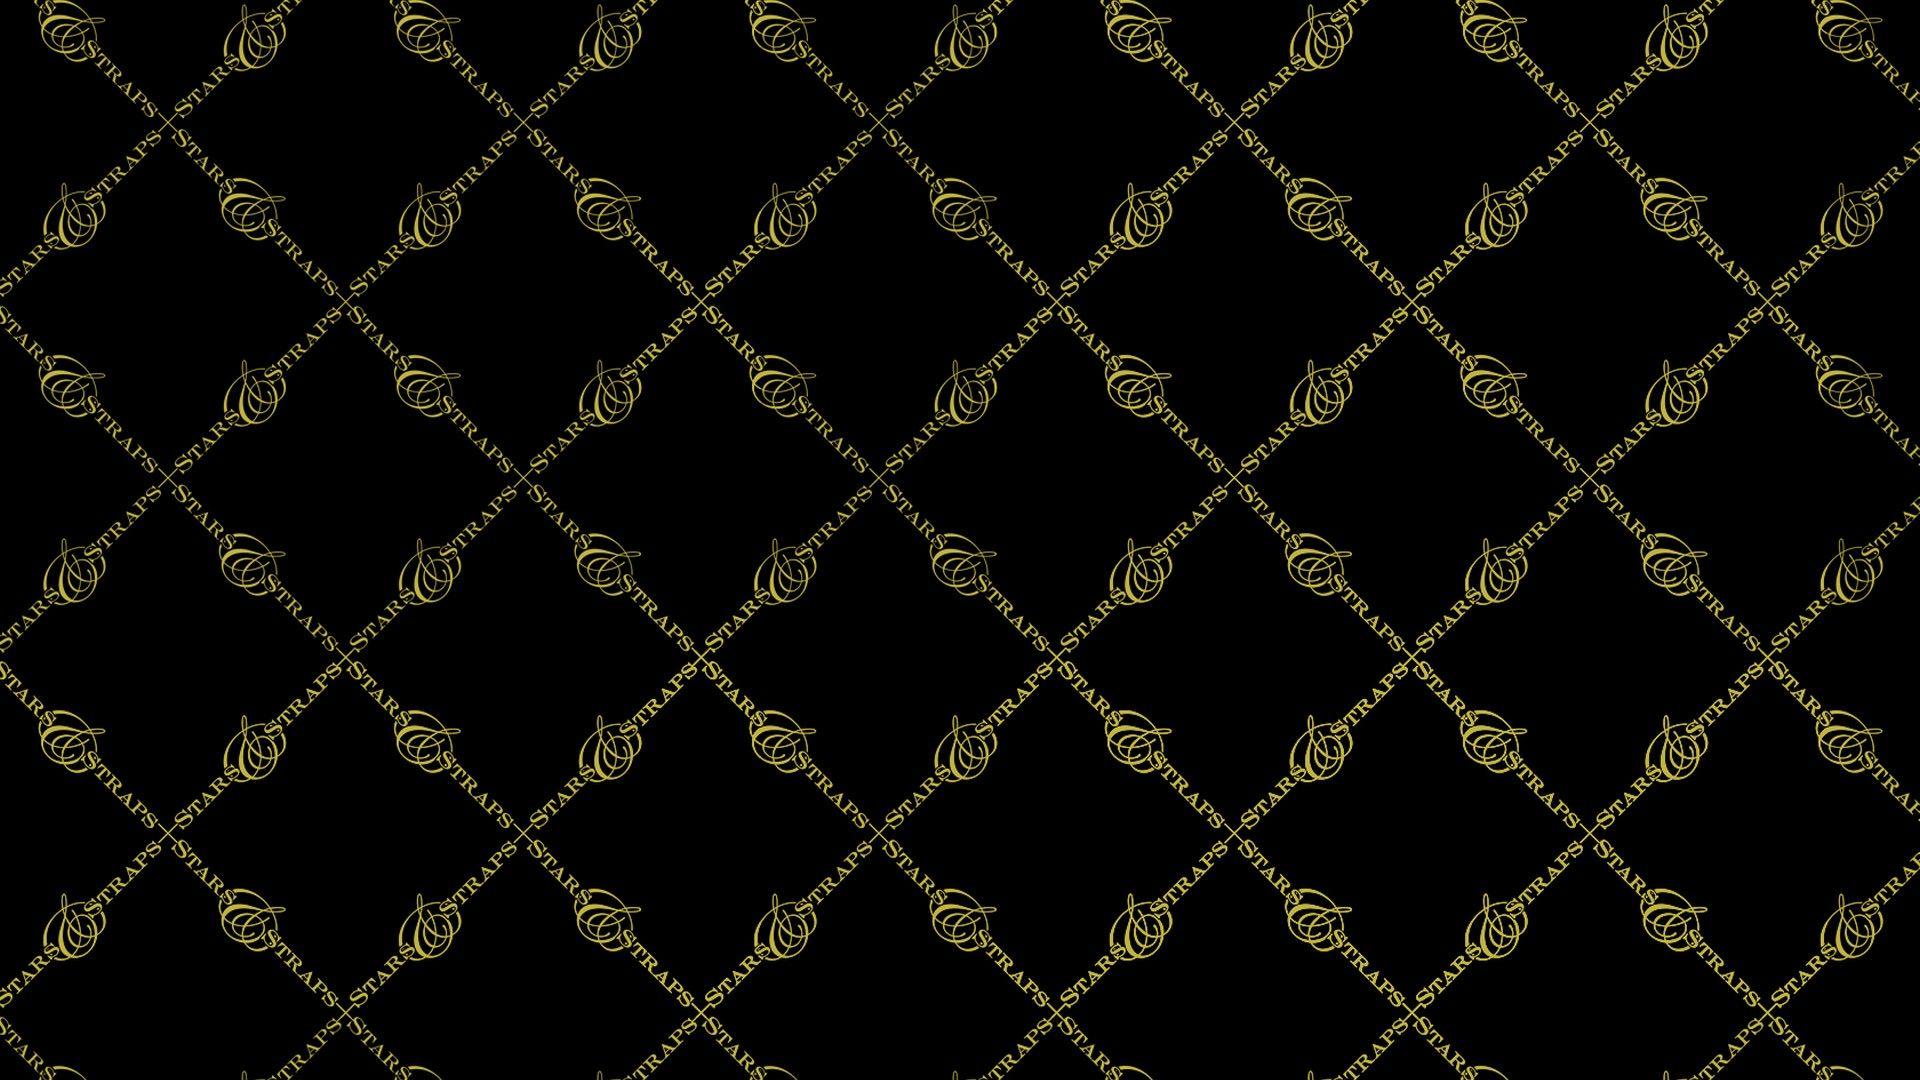 Black And Gold Desktop Wallpaper Best Hd Wallpapers Hd Cute Wallpapers Wallpaper Cute Wallpapers